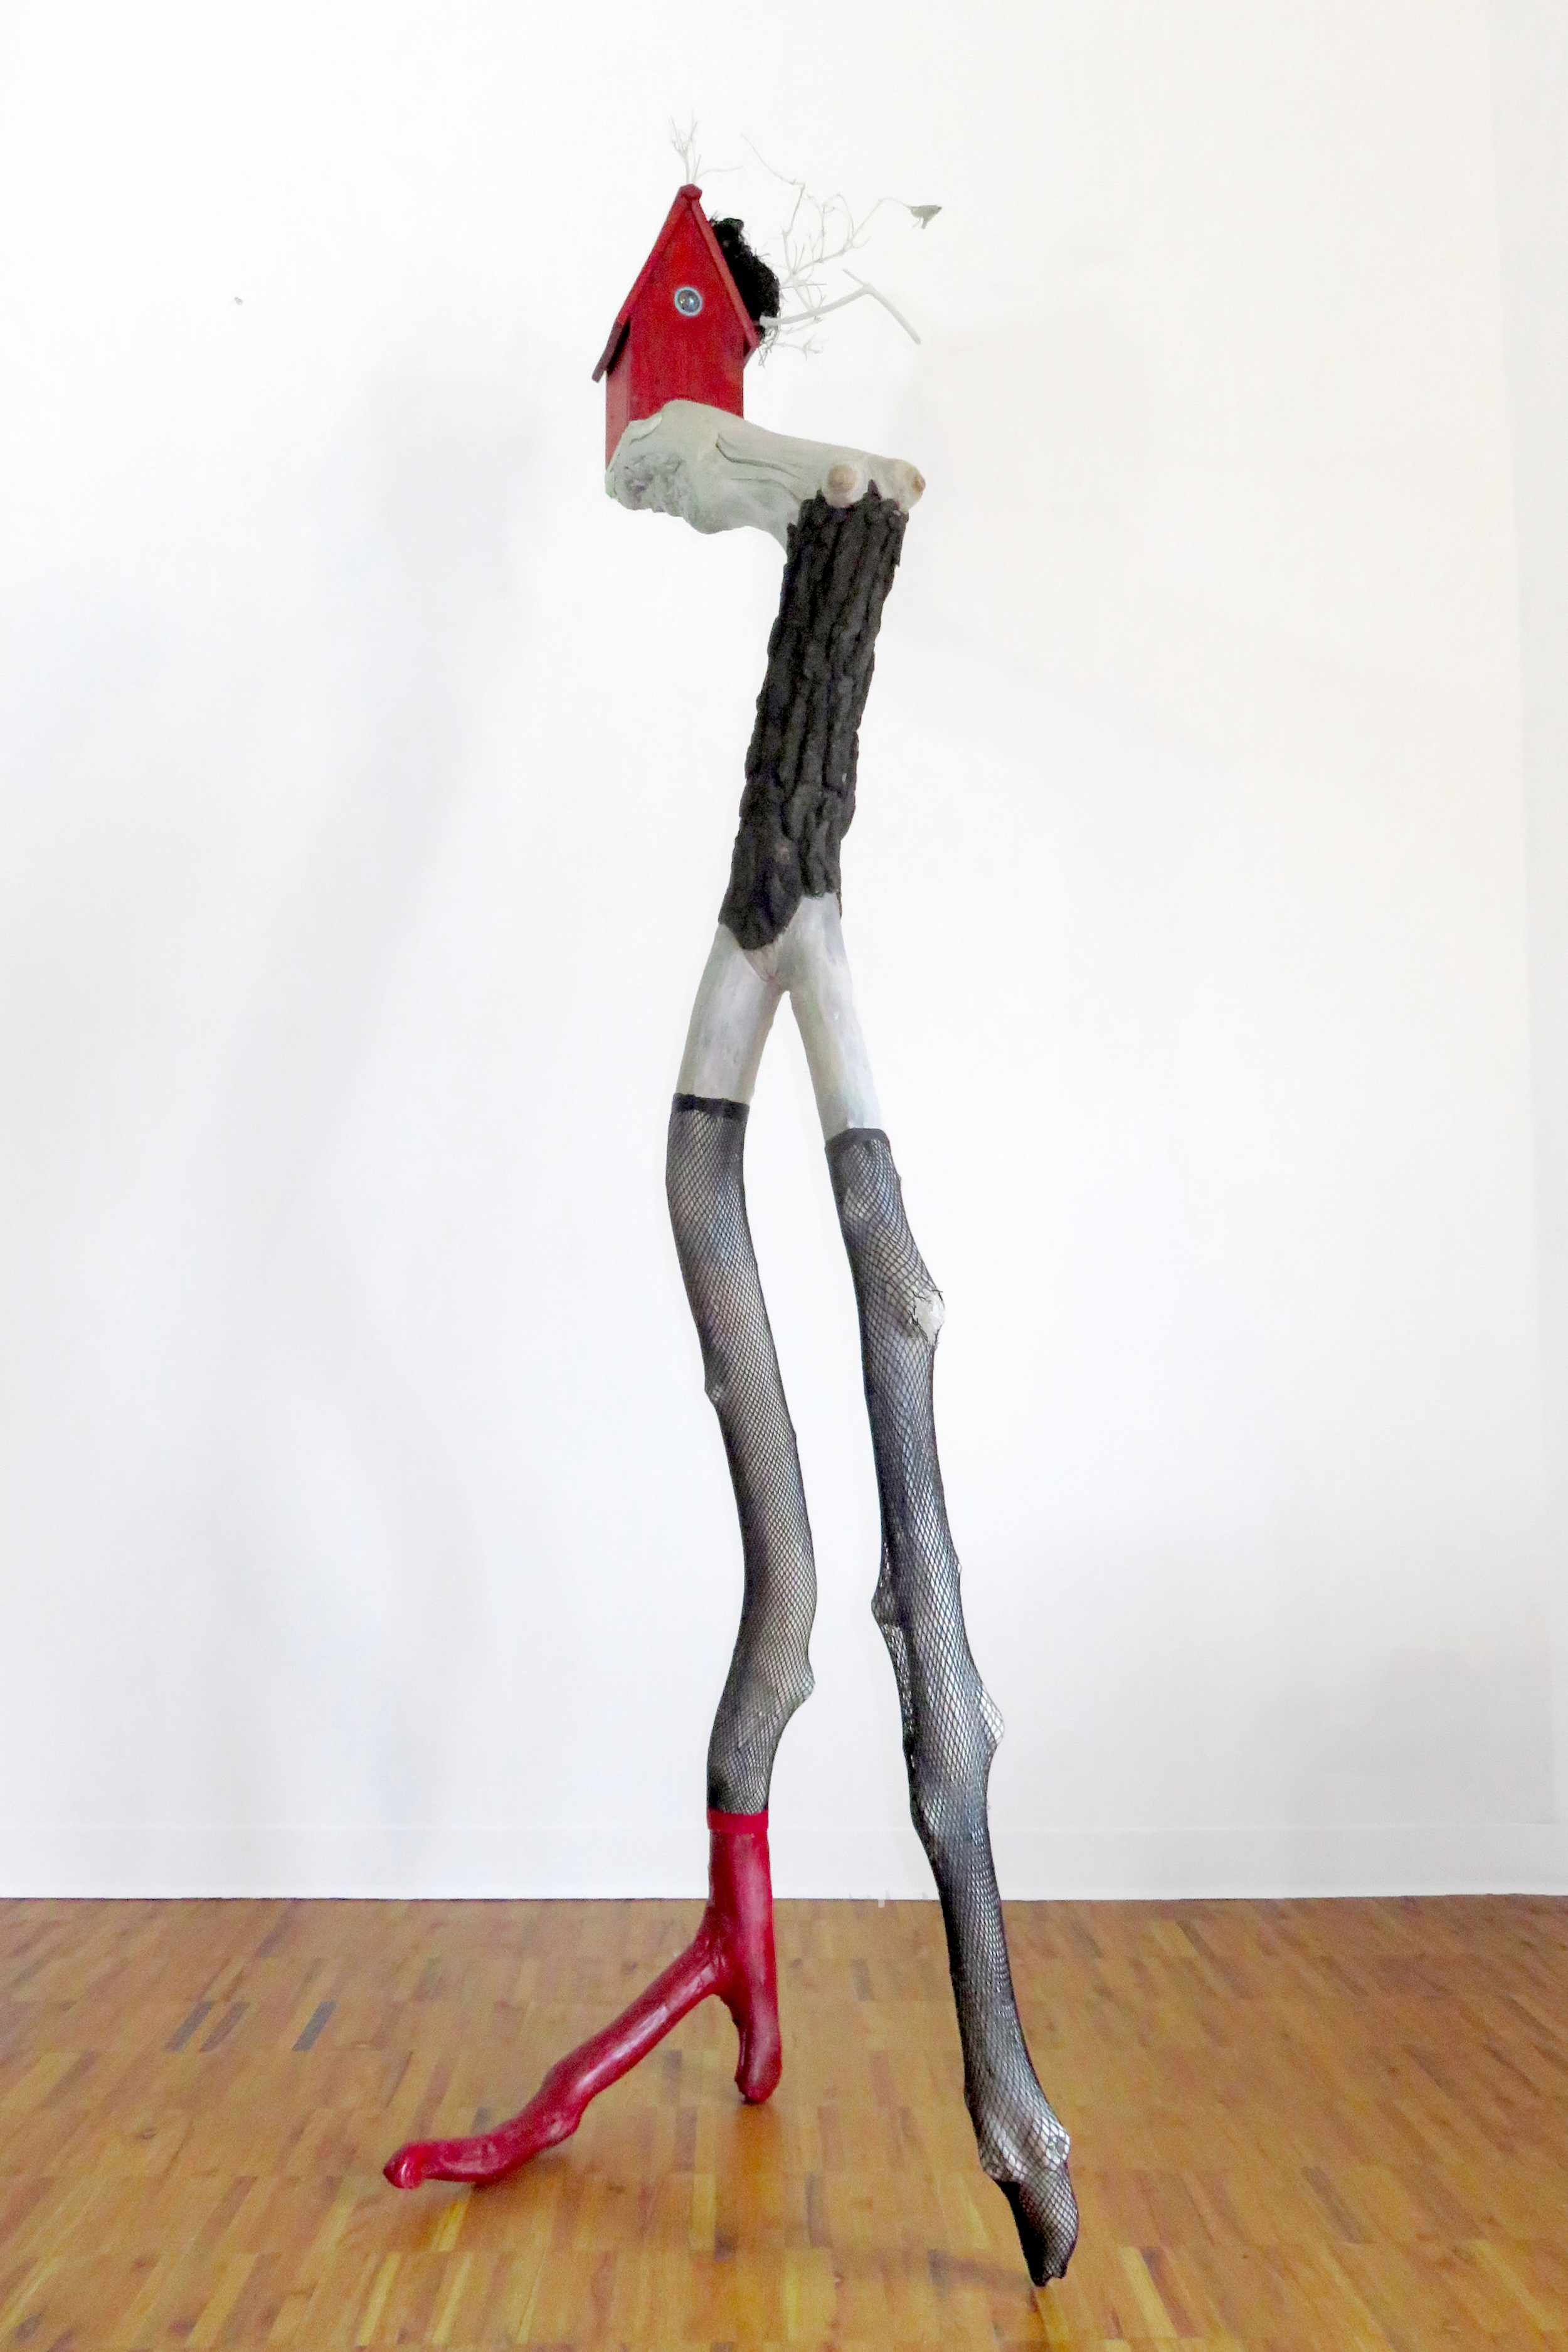 The Fascinator, 2015 Tree limbs, wood house, LED light, glass, bird's nest, nylon stockings, acrylic paints, wood stain, 96 x 30 x 32 inches